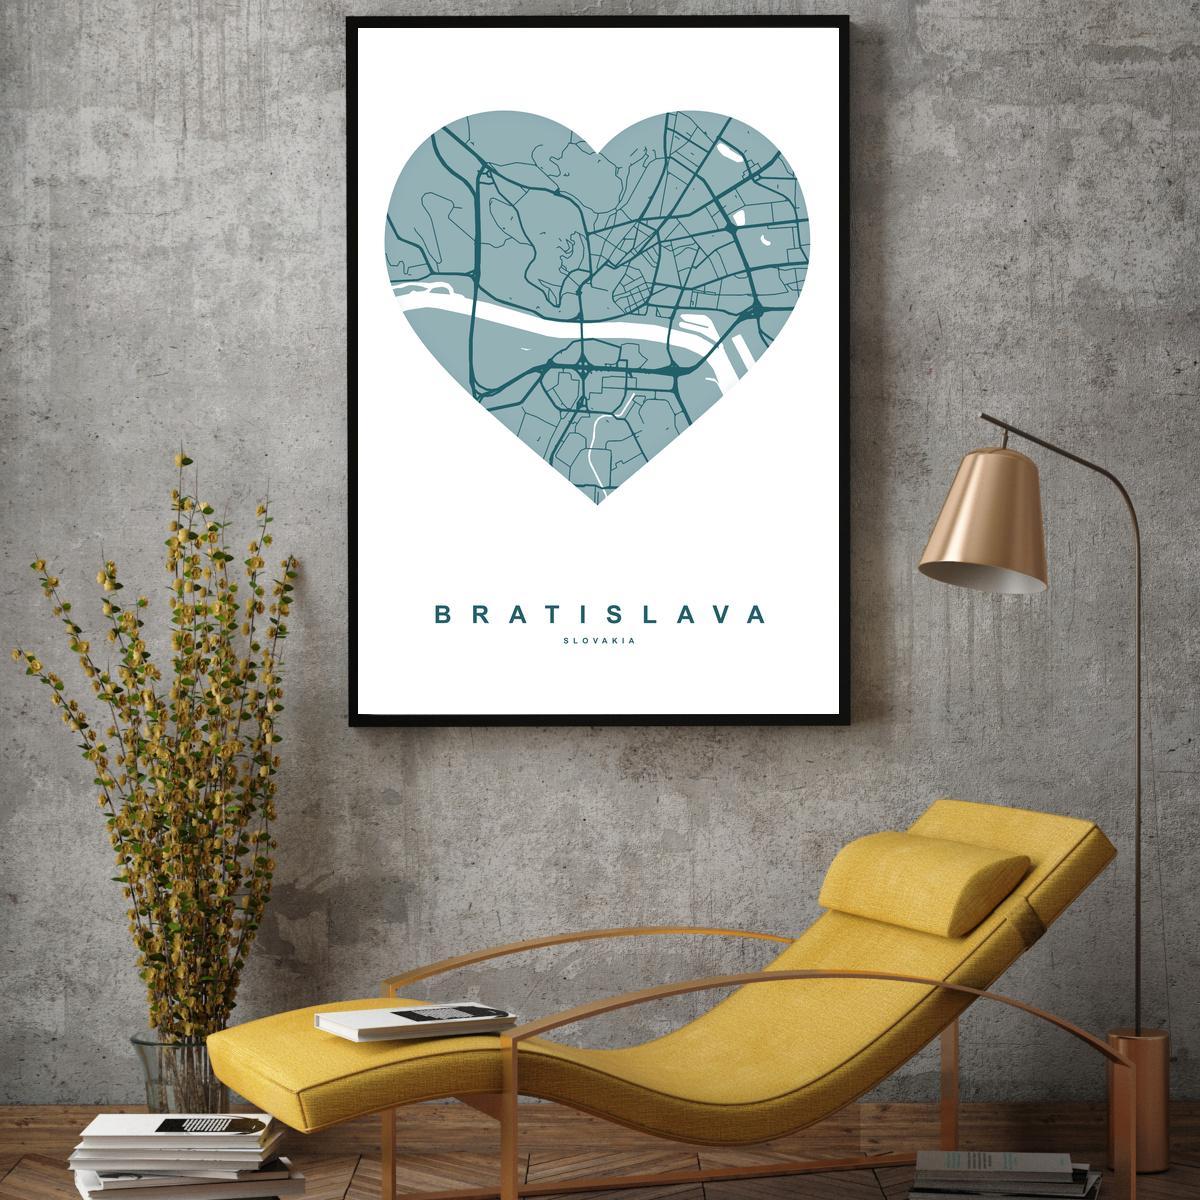 Plakat - Bratislava (S040165SA4)